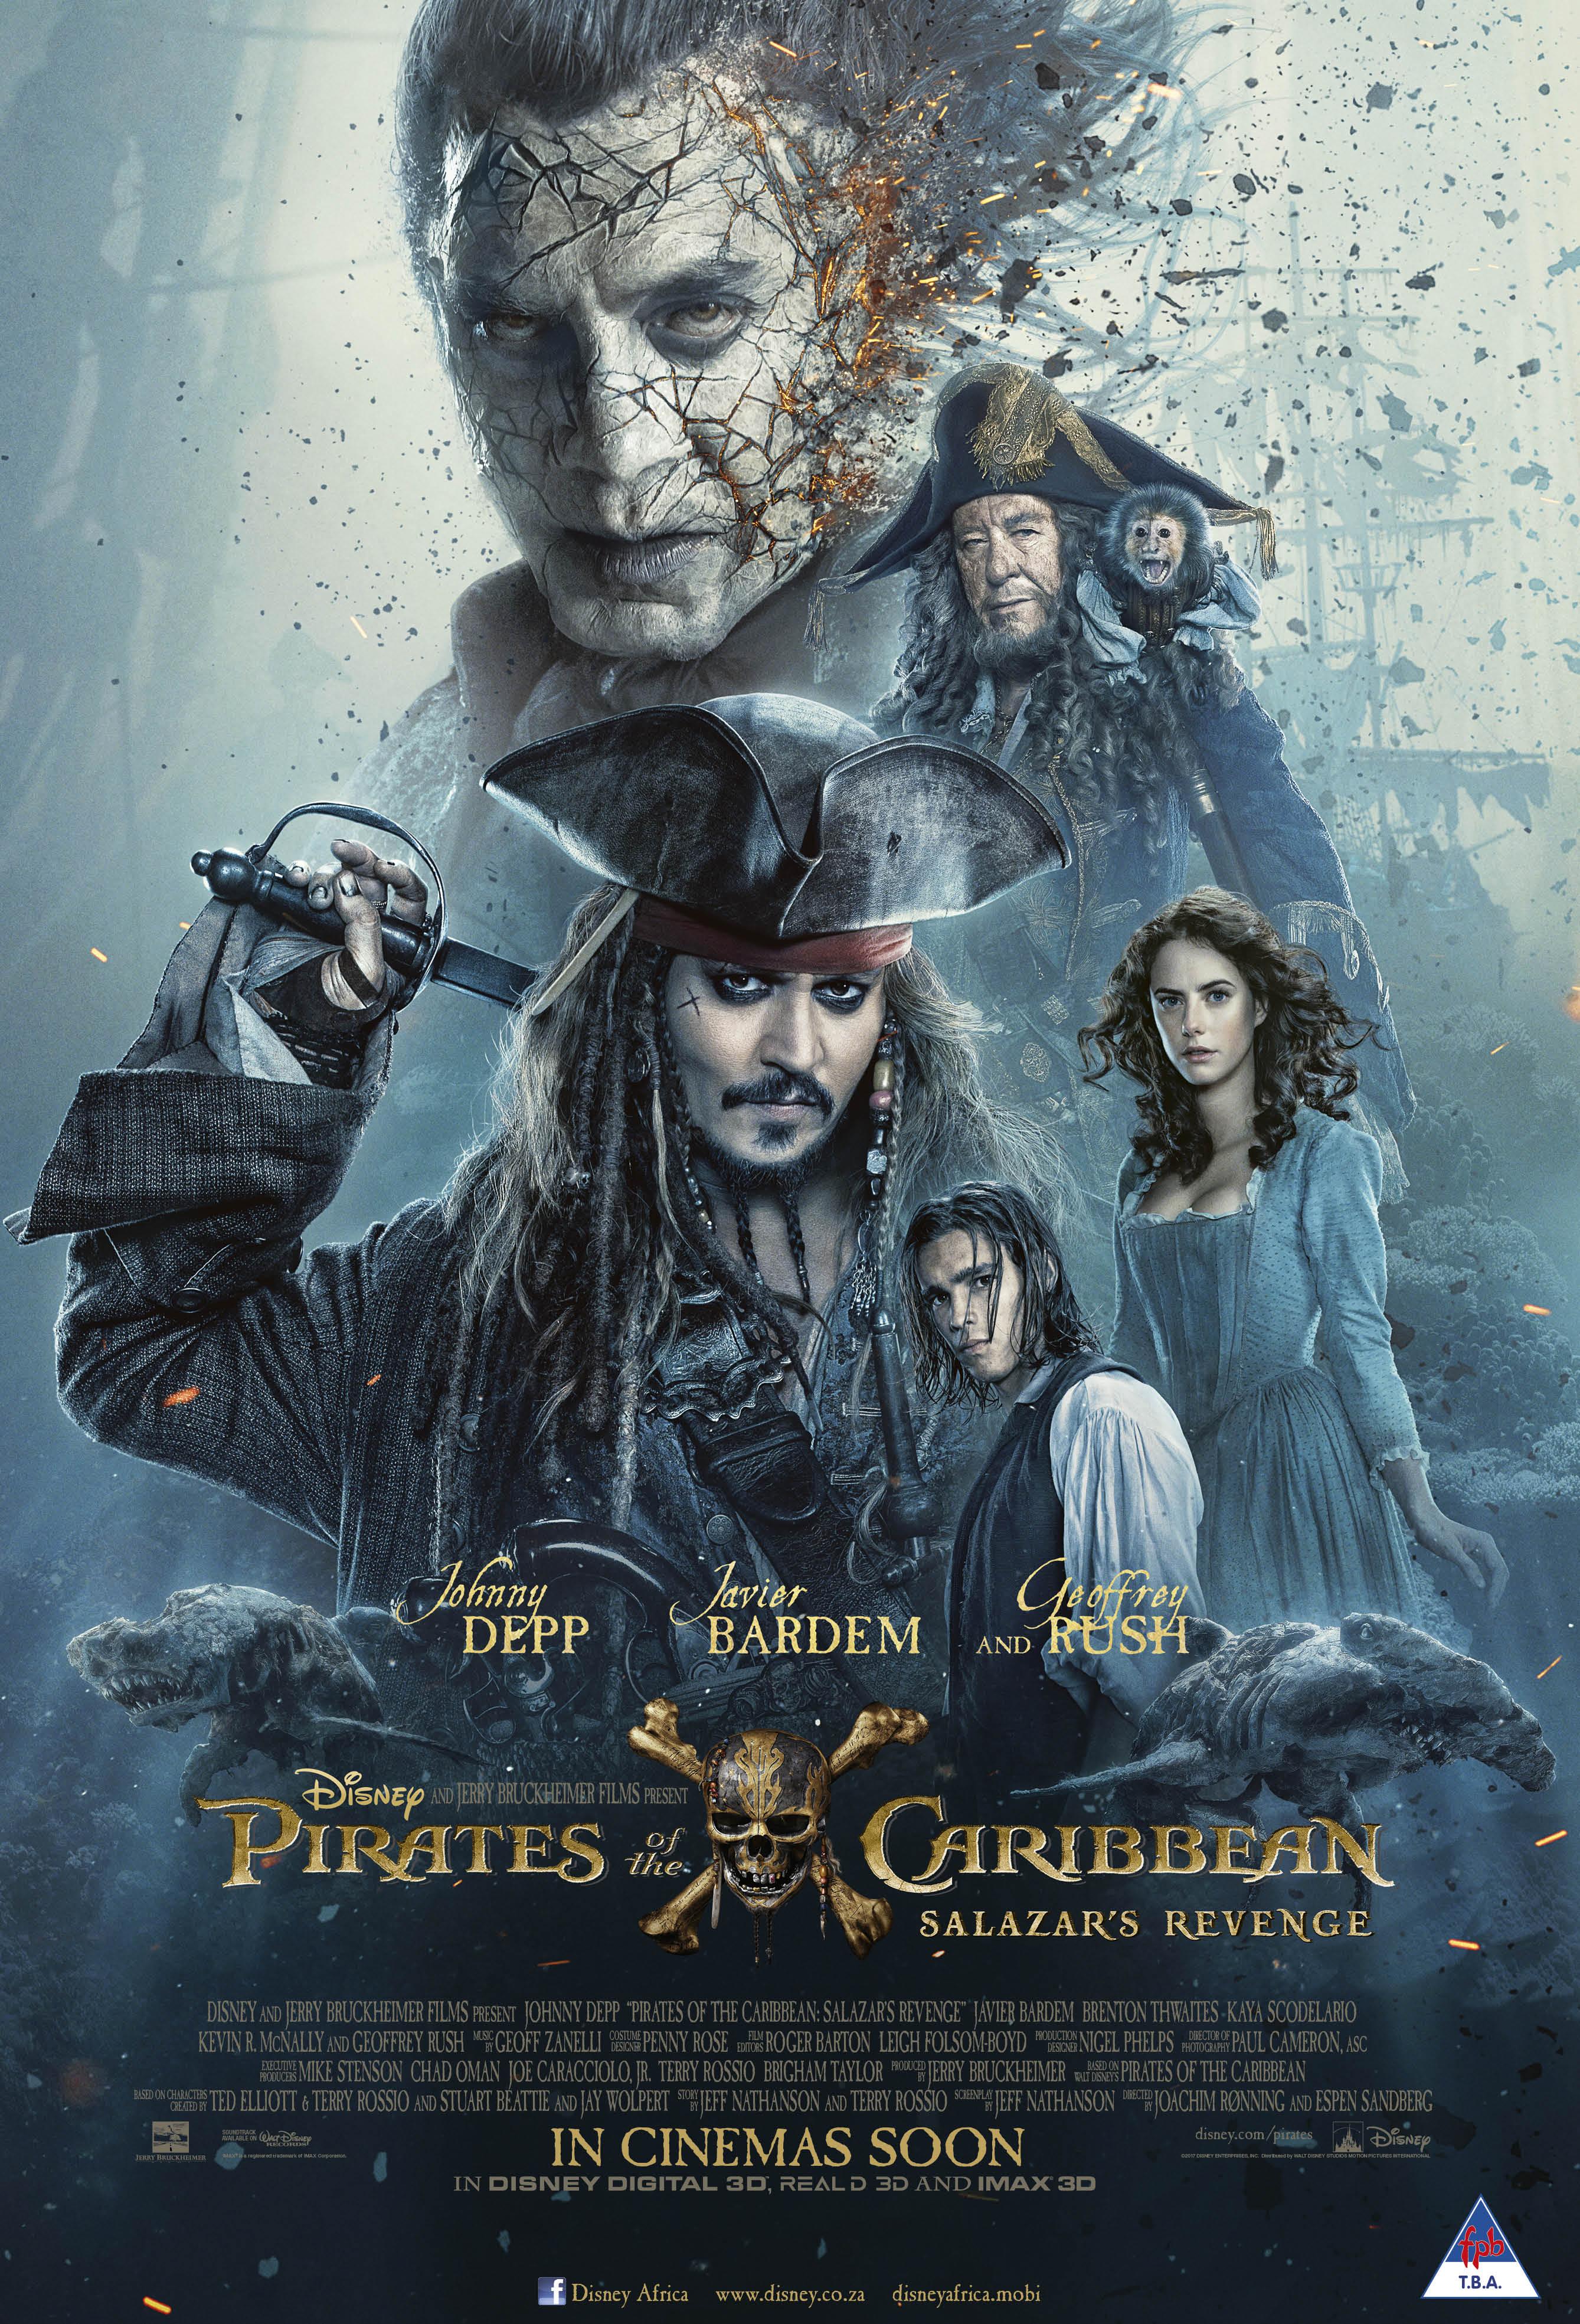 Win Exclusive 'Pirates of the Caribbean: Salazar's Revenge' Merchandise